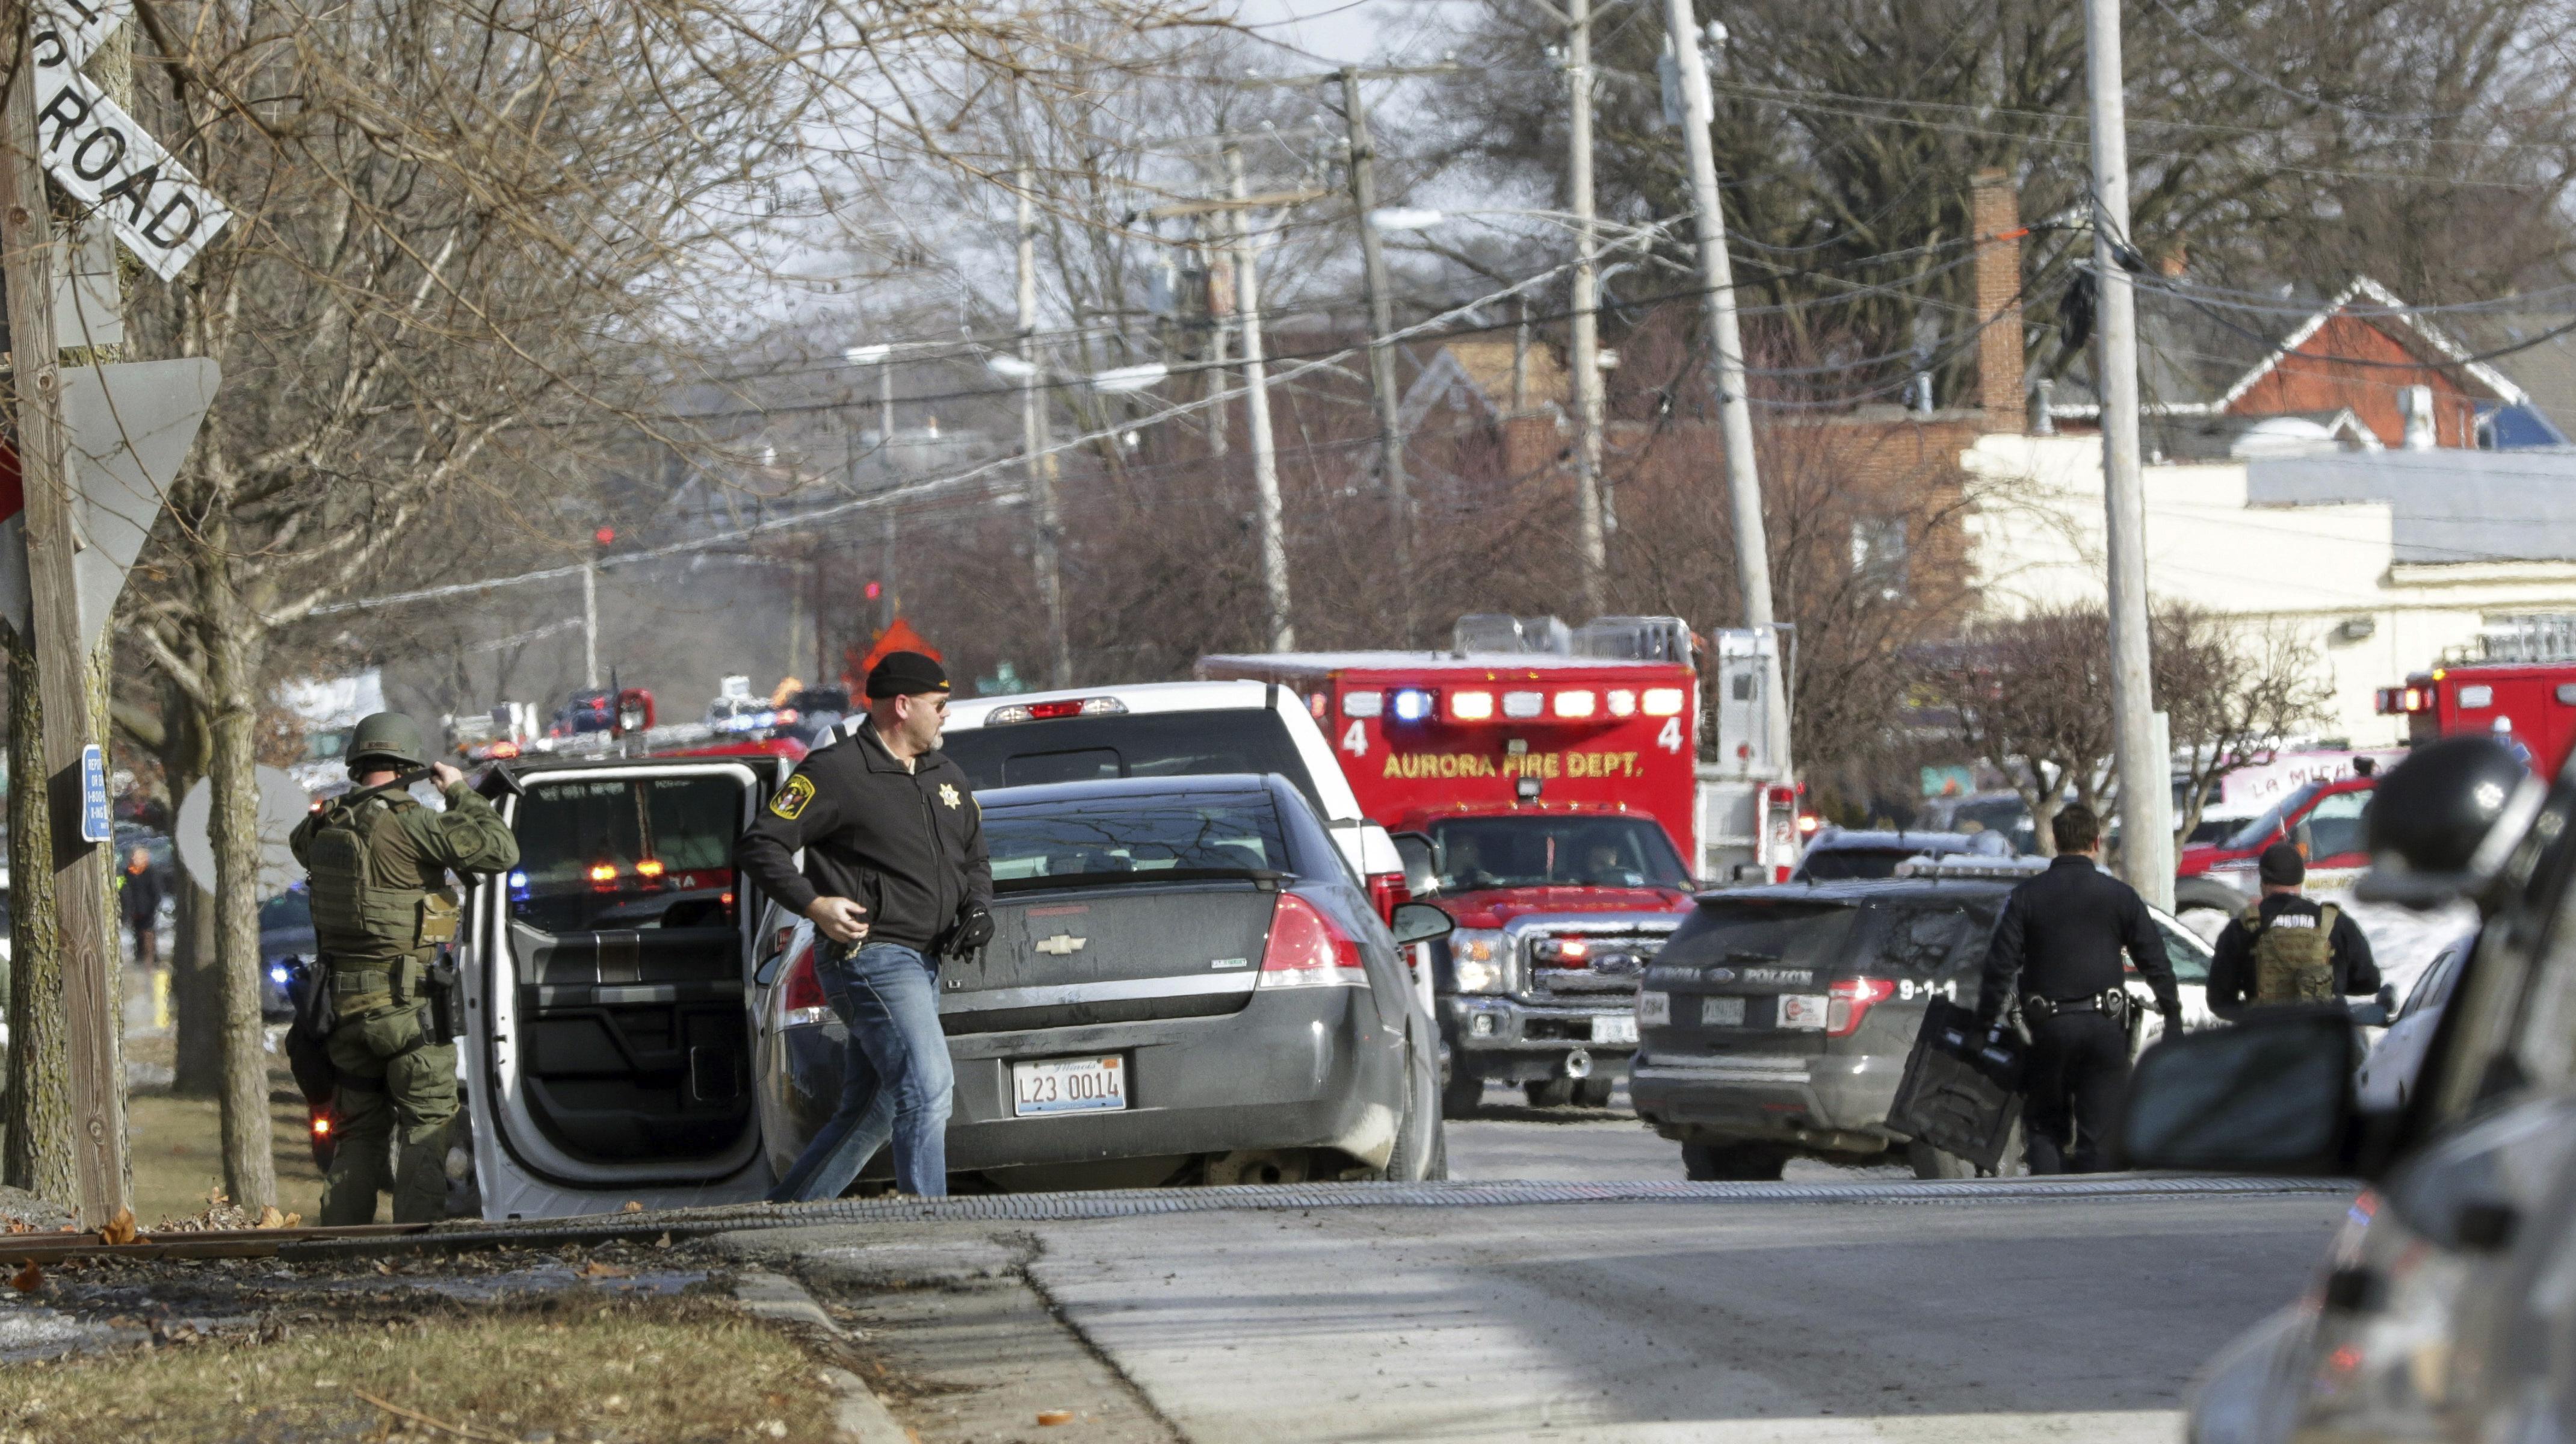 Aurora shooting: Gary Martin opened fire inside Henry Pratt